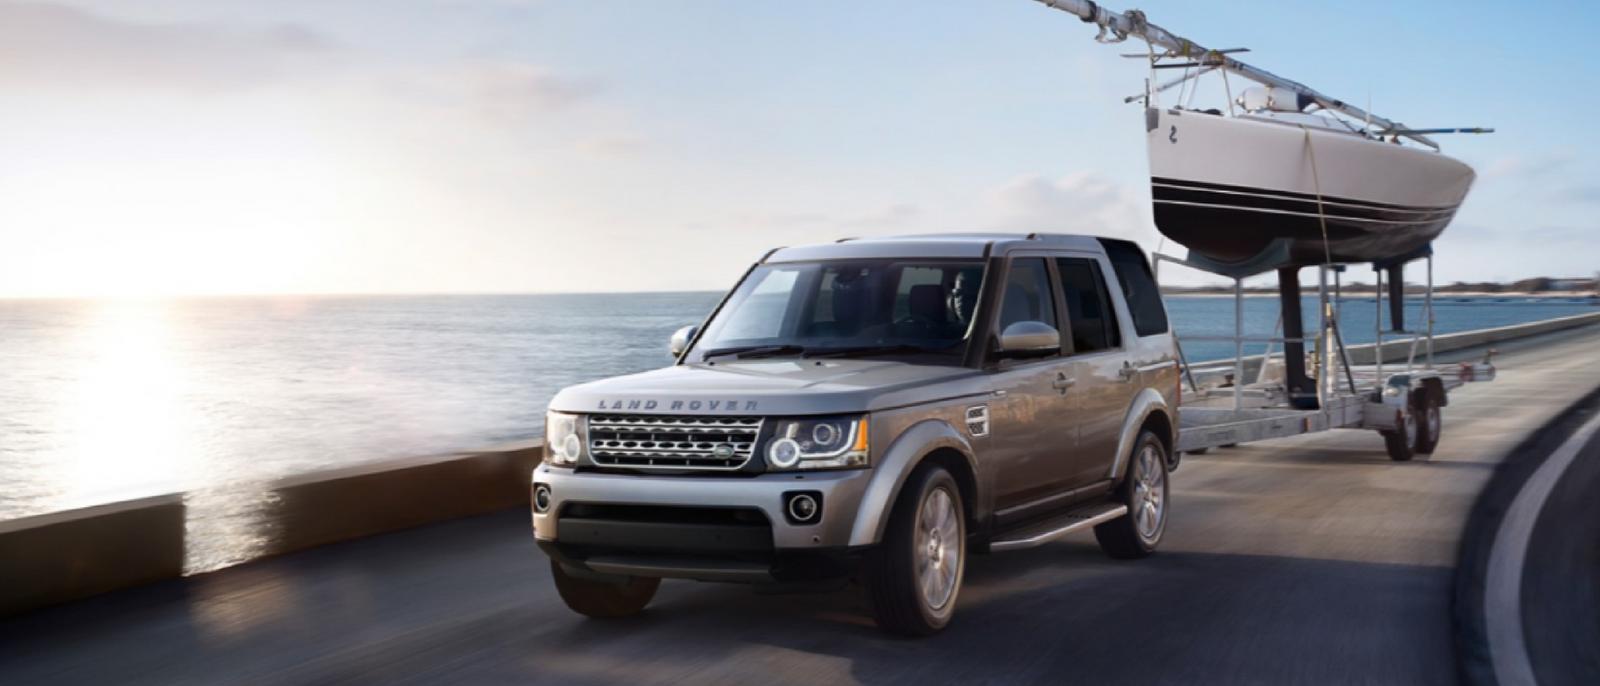 2016-Land-Rover-LR4-Exterior